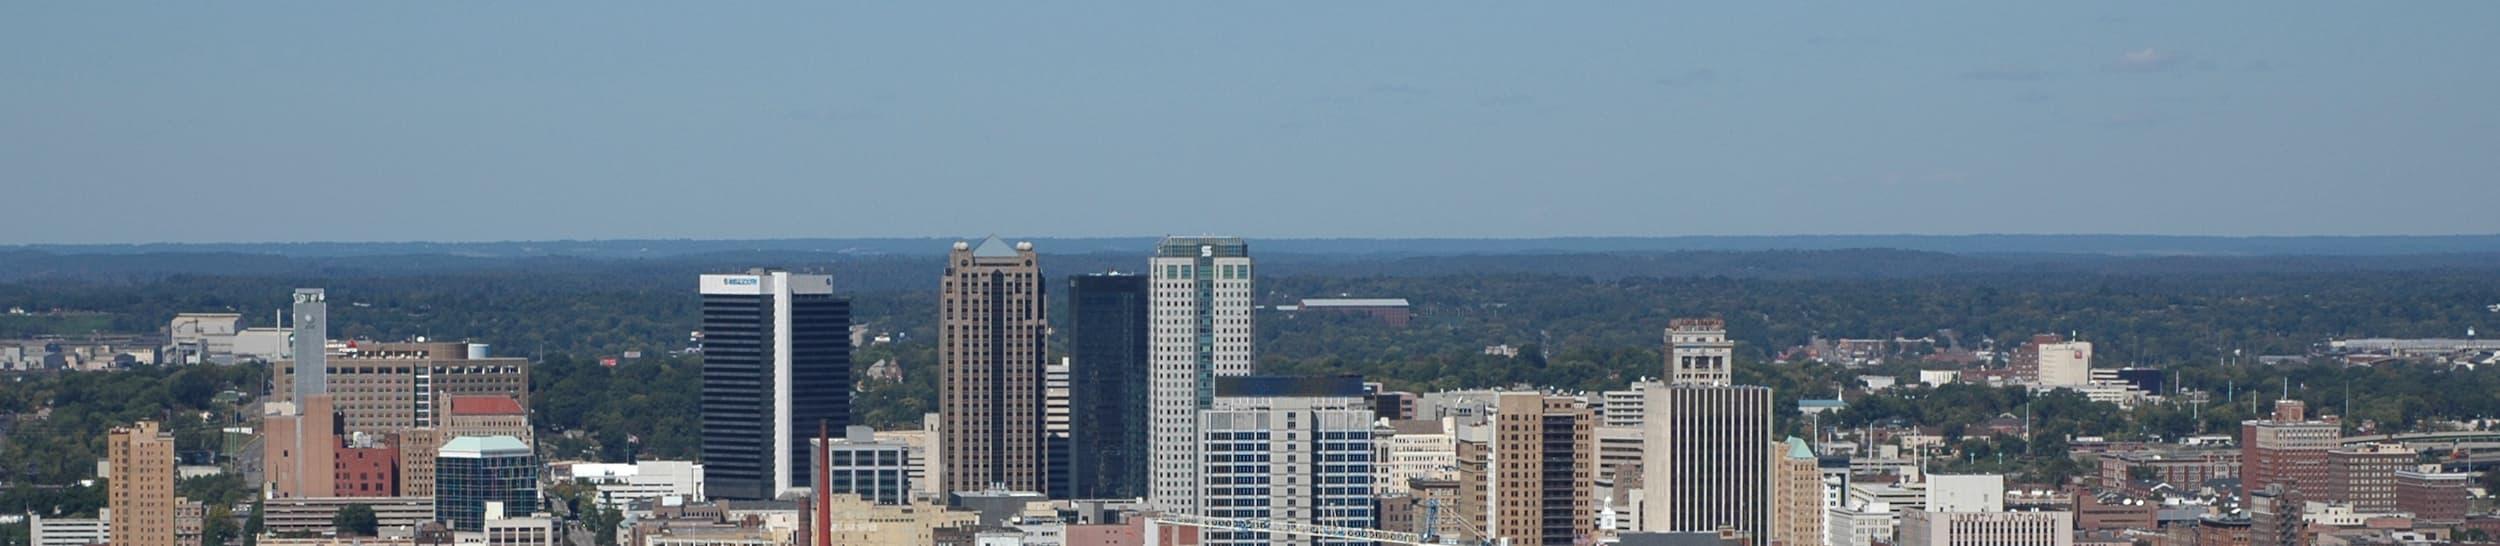 Pictured: skyline of Birmingham